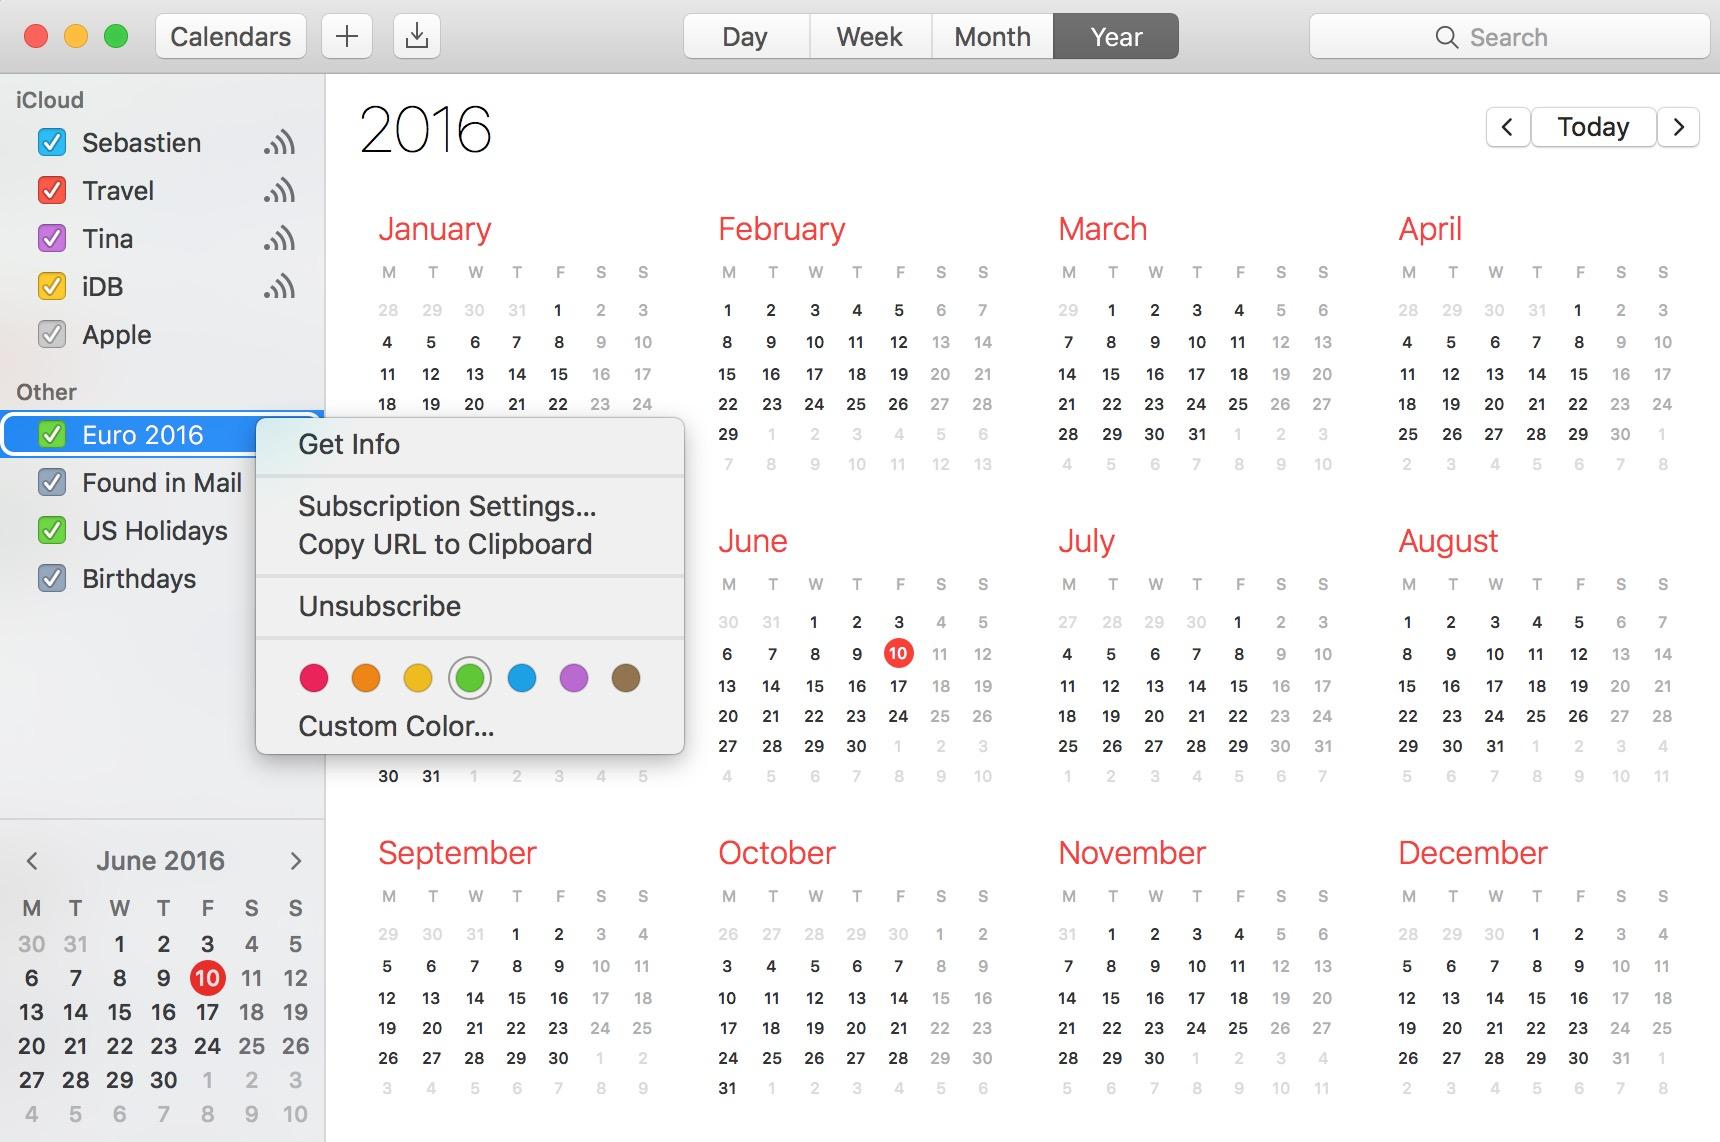 Subscribed calendar info